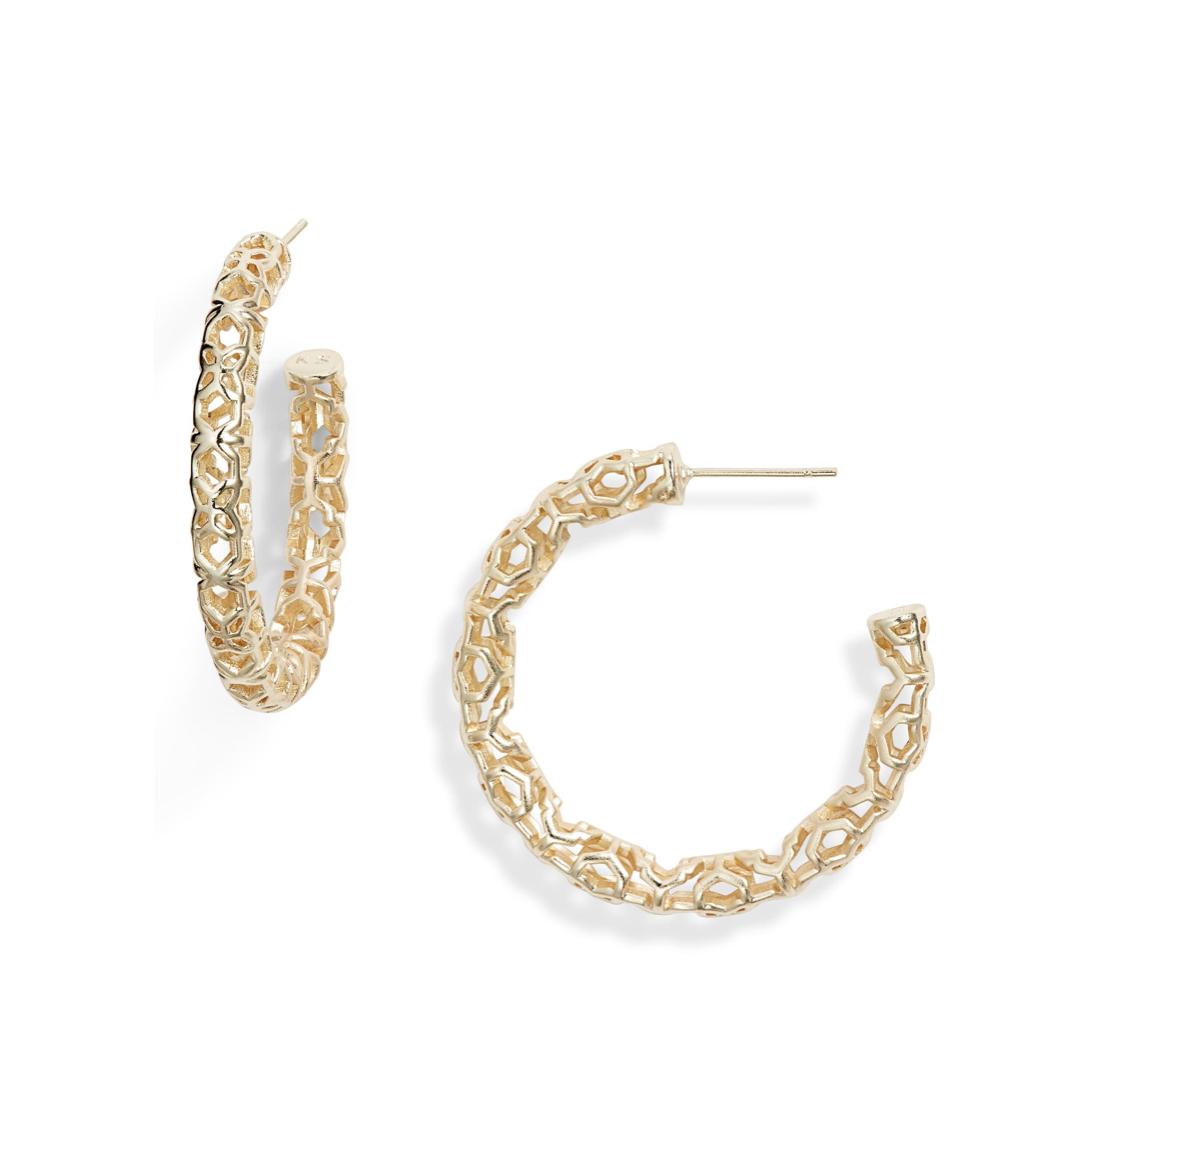 Kendra Scott Gold Hoops | Nordstrom Anniversary Sale | A Demure Life Fashion Blog